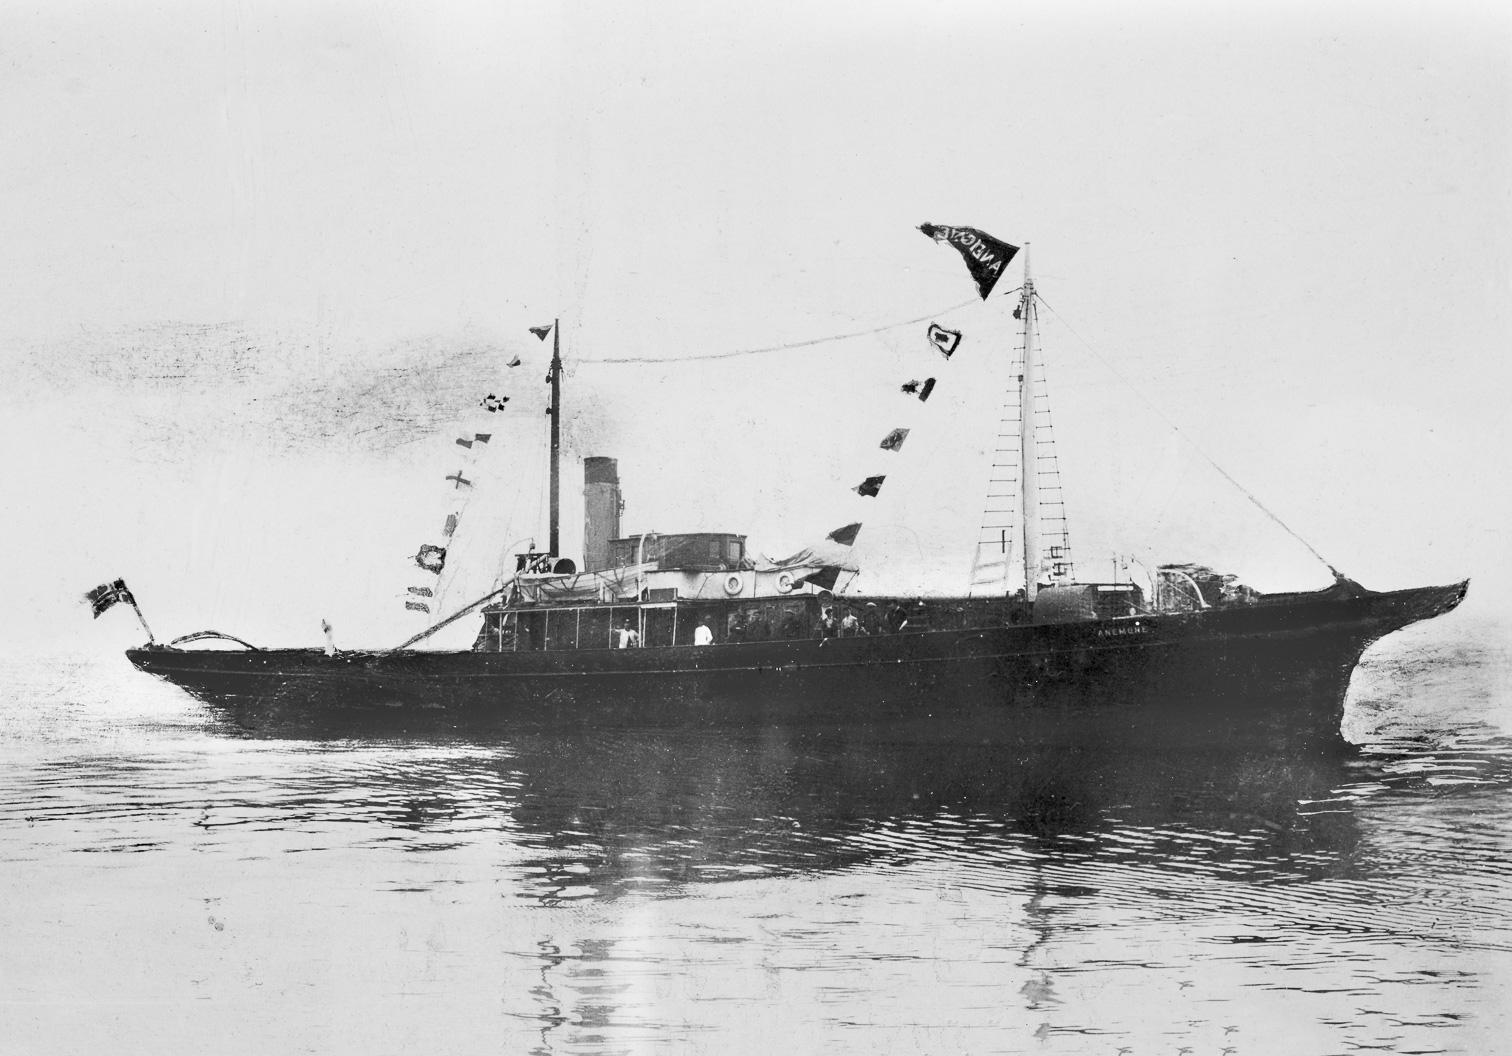 SS Anemone